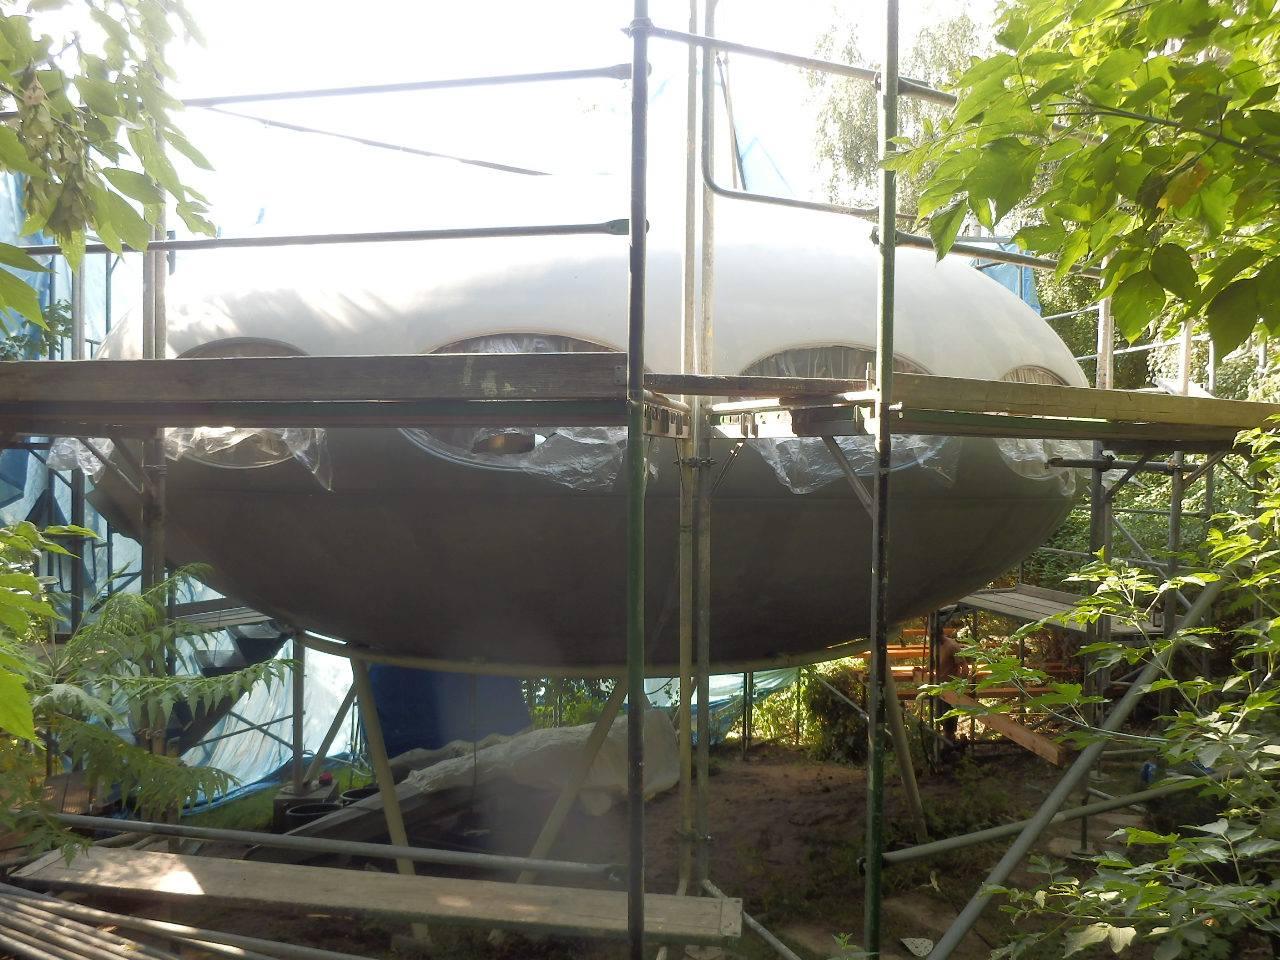 Futuro berlin germany restoration photos cora facebook timeline posted 080113 2